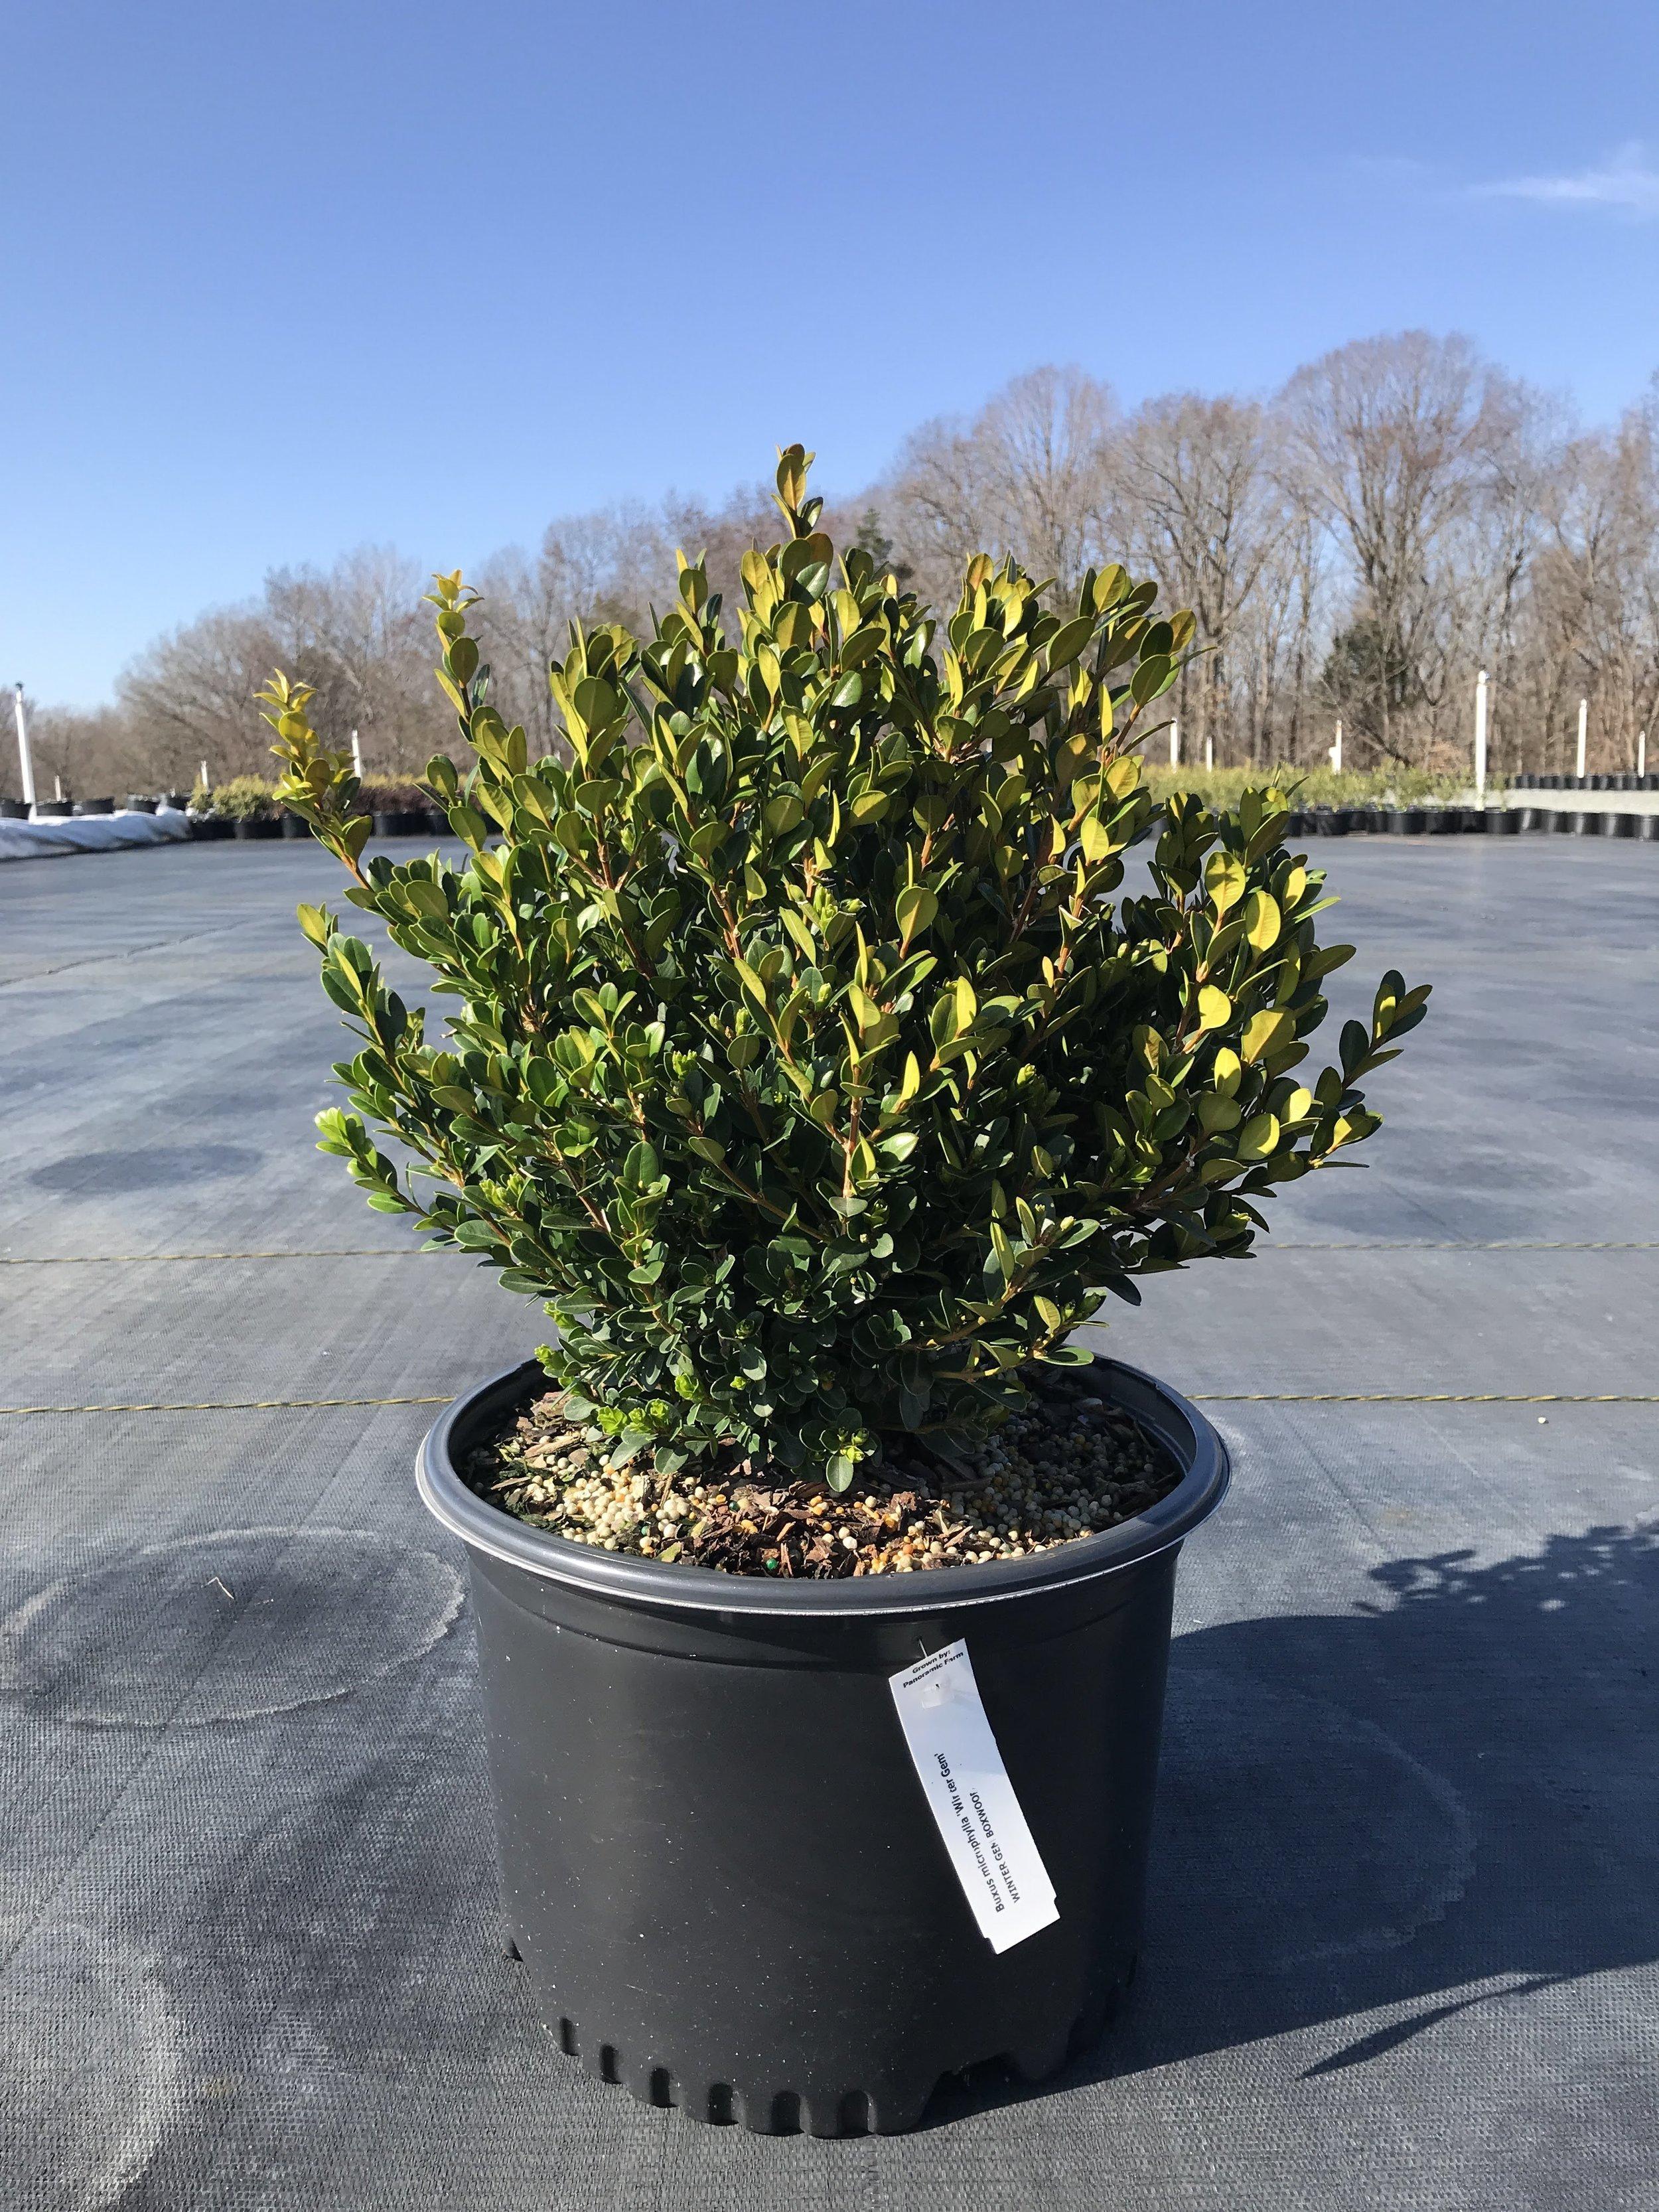 Buxus microphylla 'Winter Gem' 3 gallon